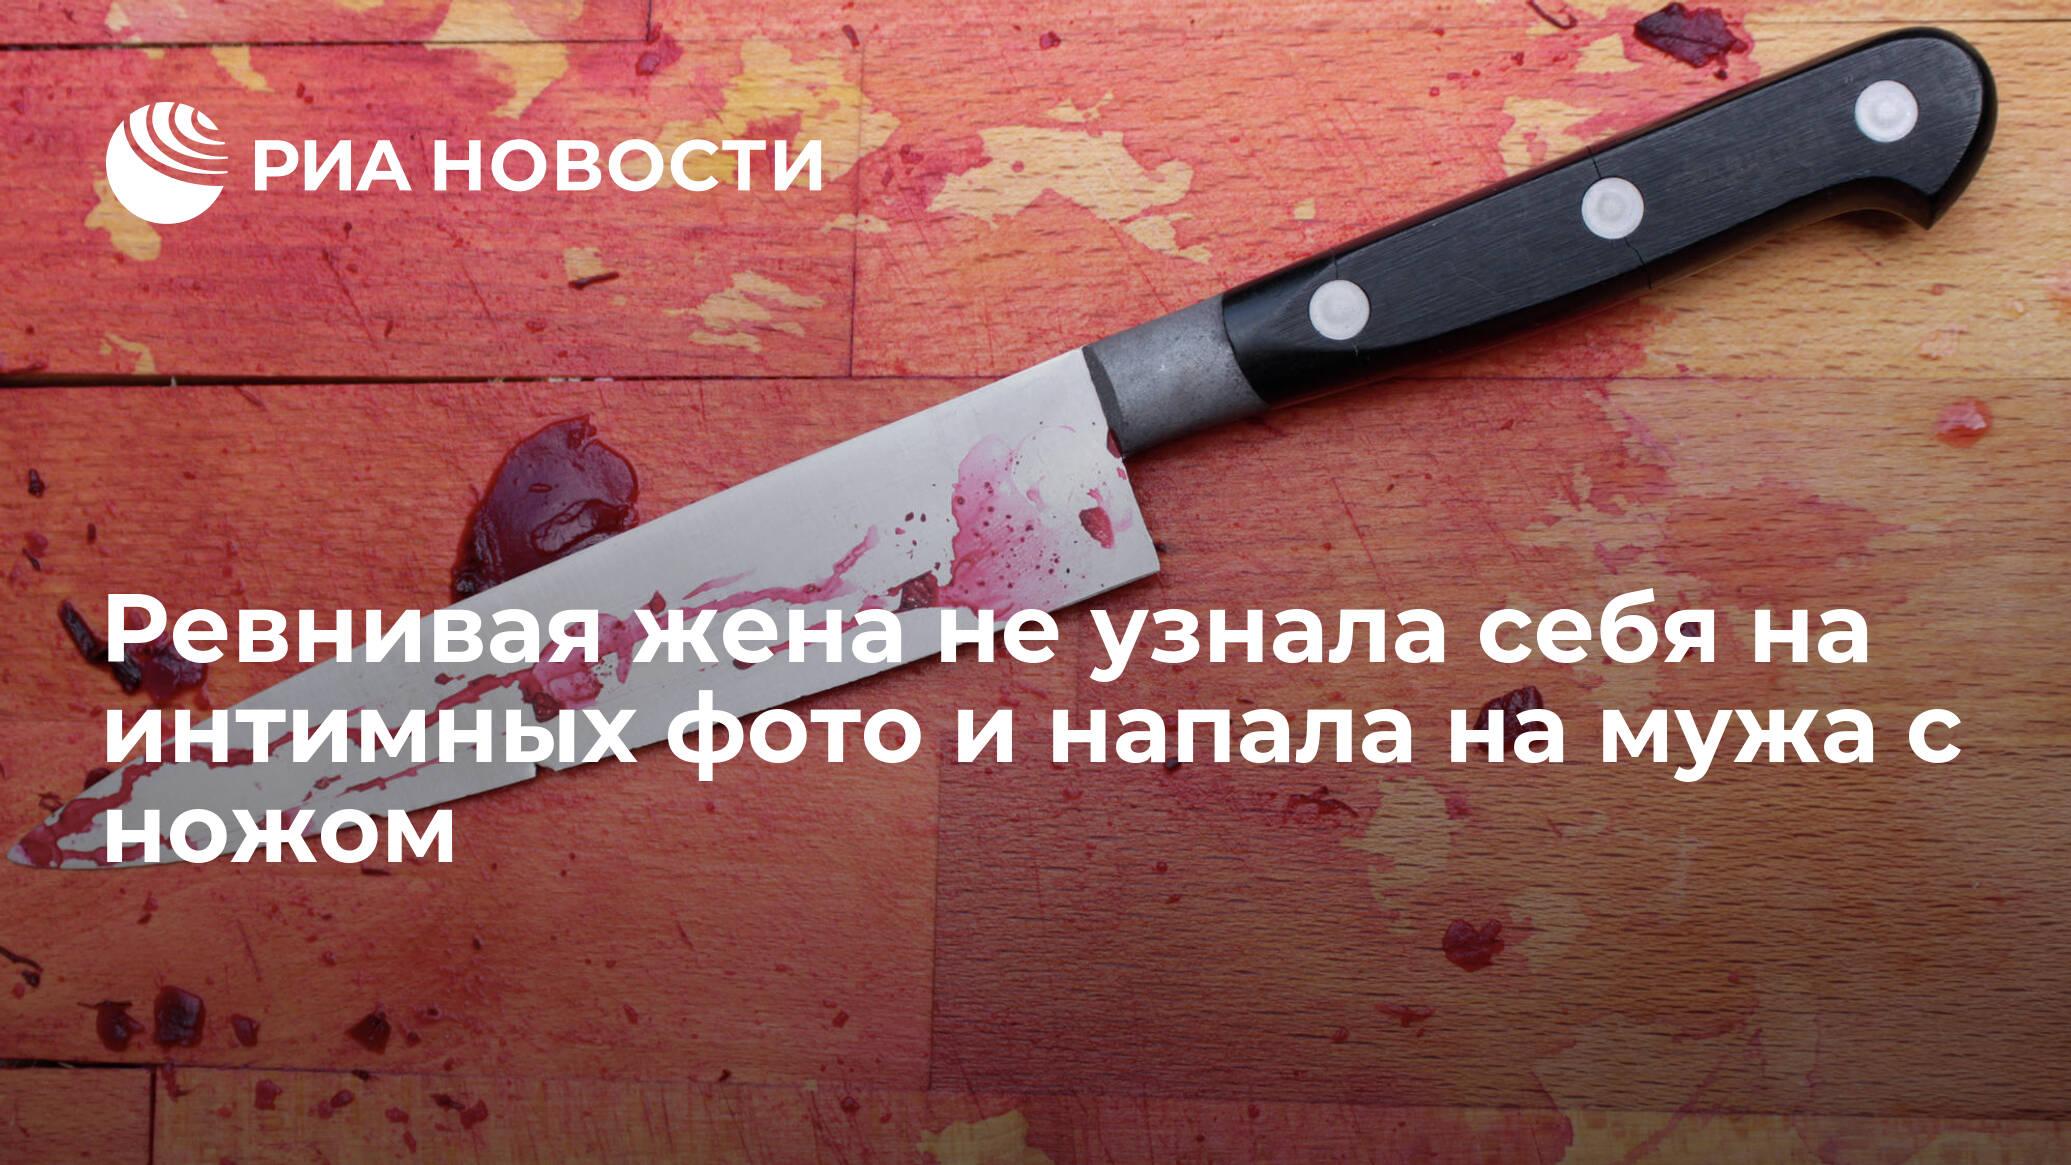 Ревнивая жена не узнала себя на интимных фото и напала на мужа с ножом